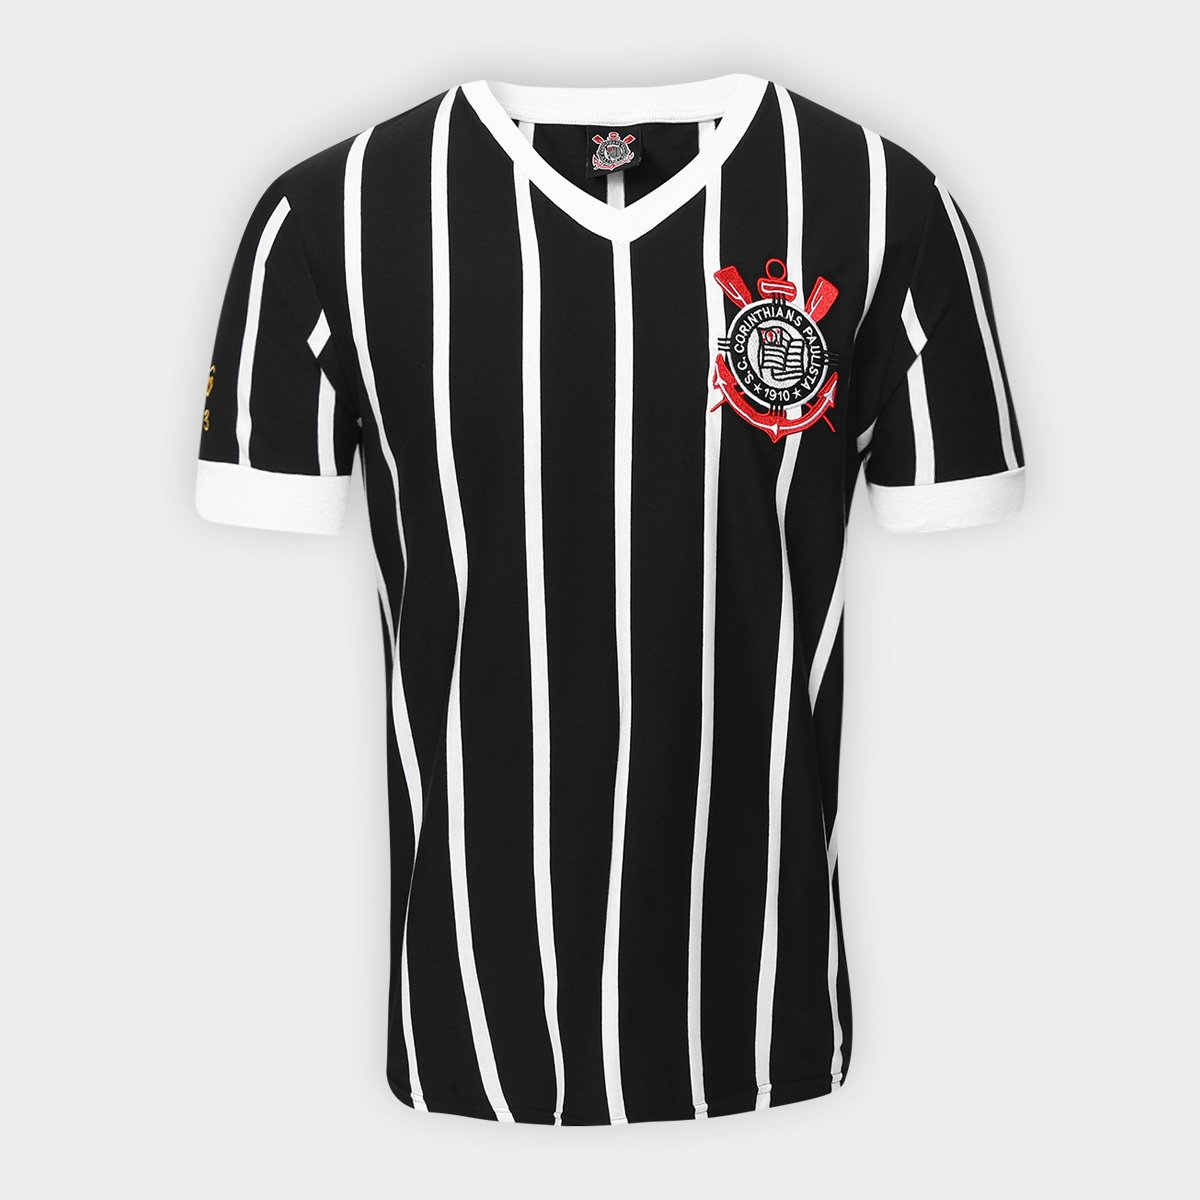 Camiseta Corinthians Réplica 1983 Masculina abe10ca280ffd